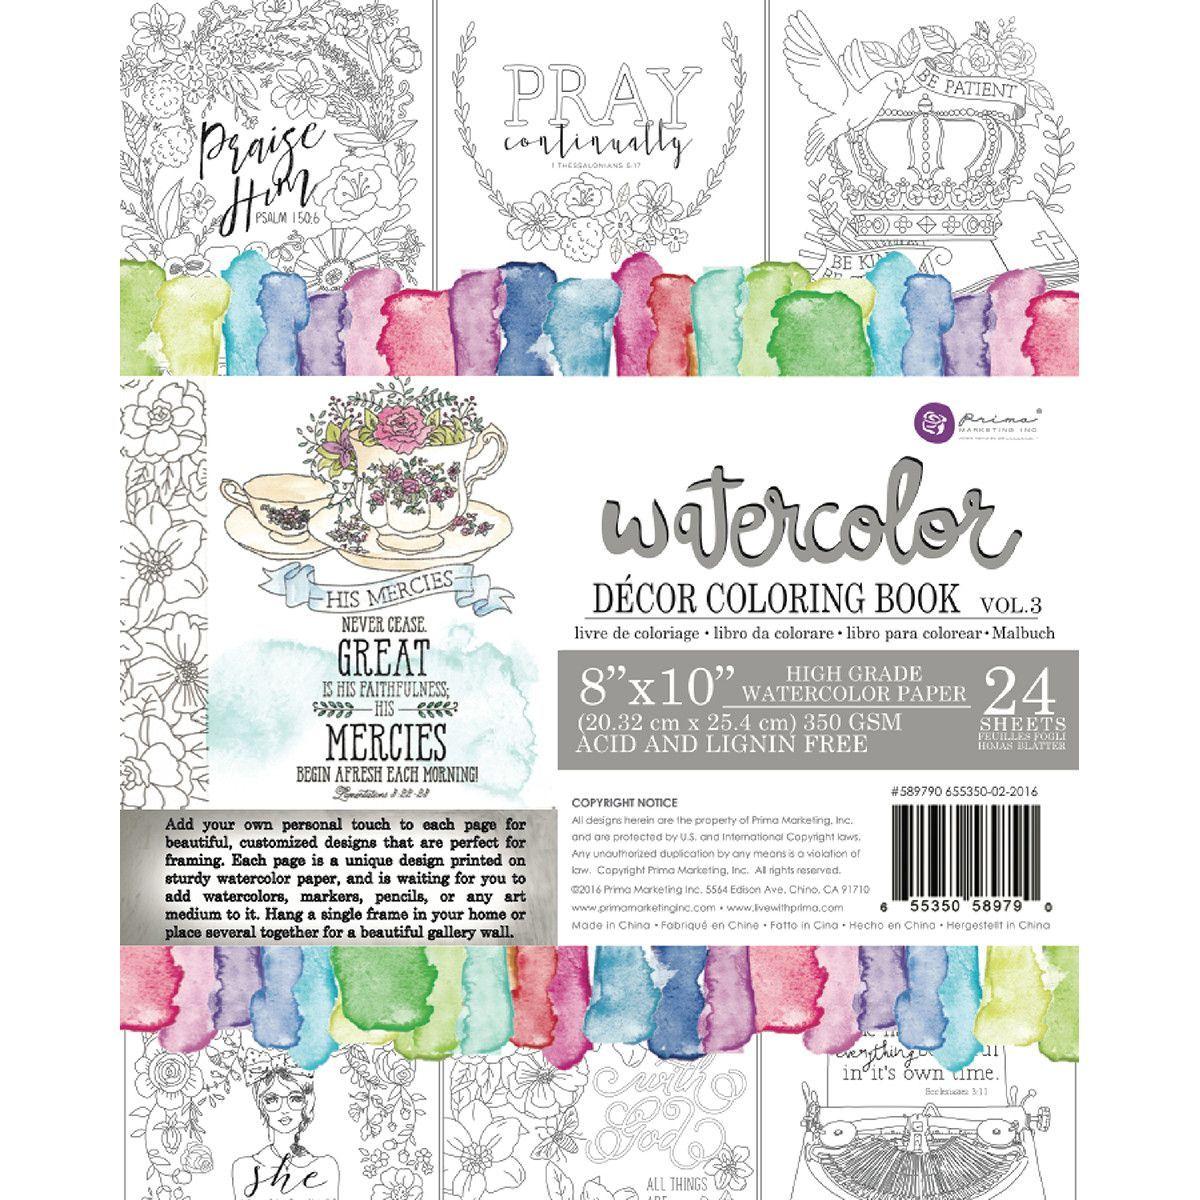 Watercolor paper coloring book - Prima Marketing Coloring Book Vol 3 Watercolor Decor Faith